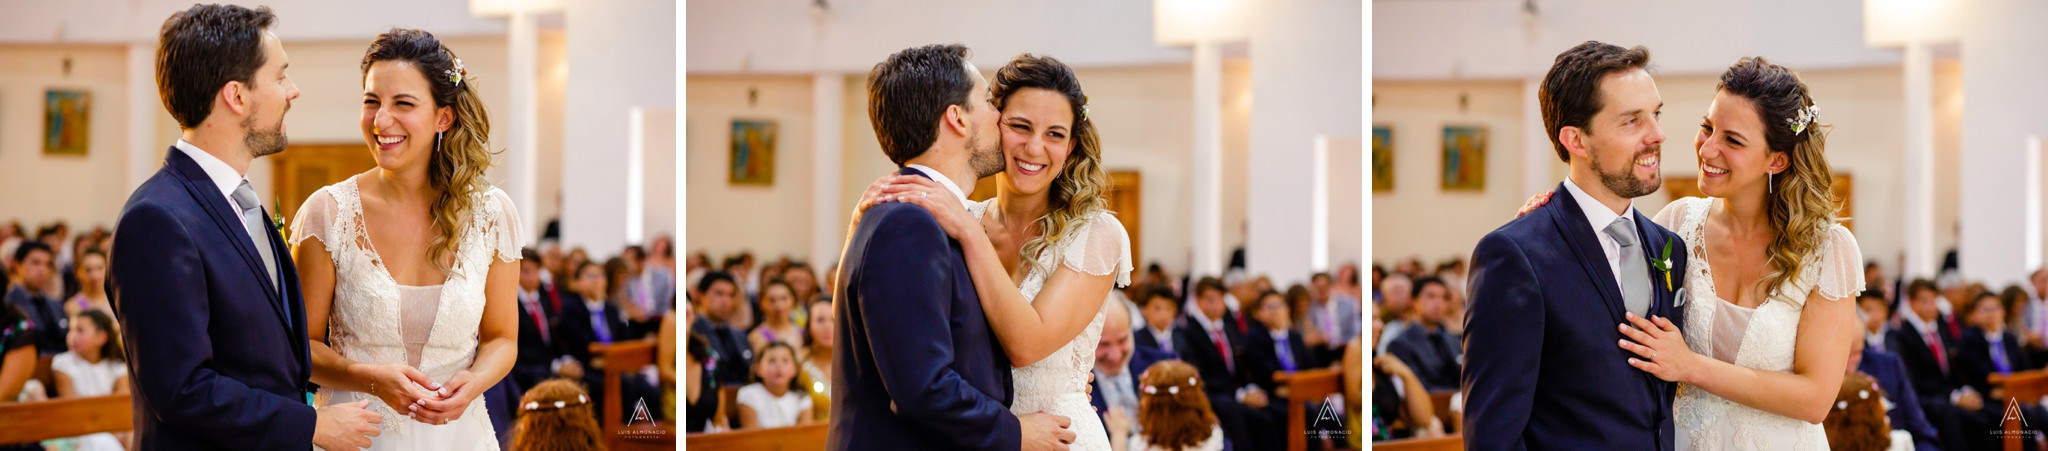 foto-matrimonio-Parroquia-San-Jose-la-reina